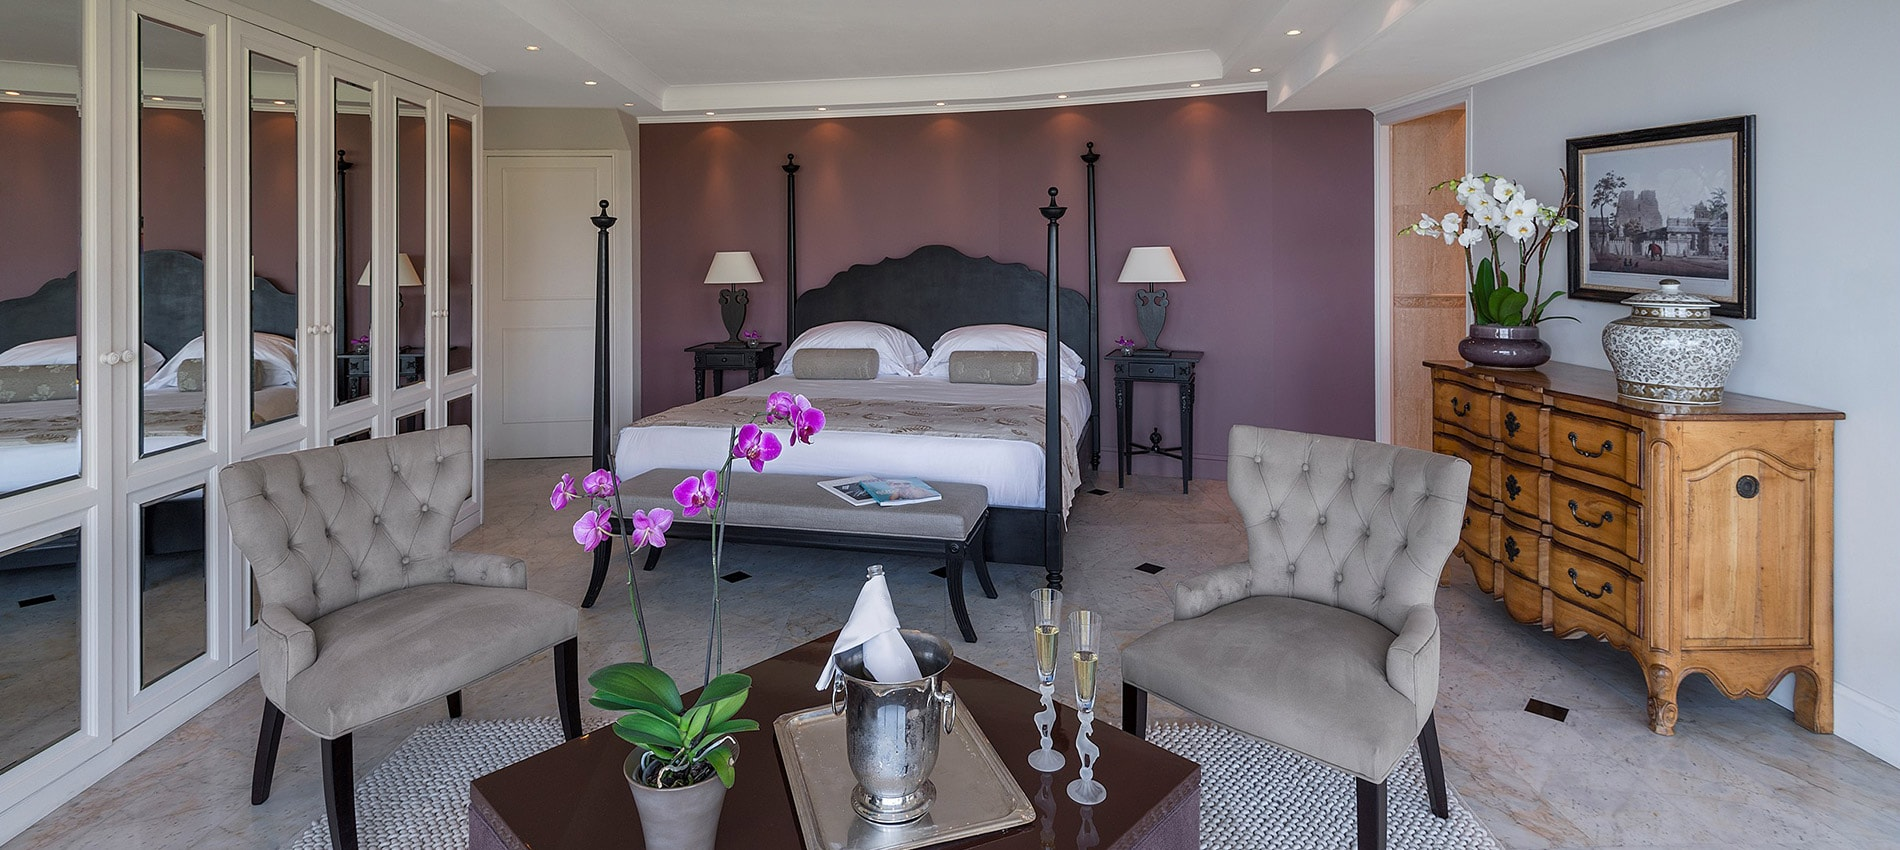 chevre-dor-luxury-hotel-13-w